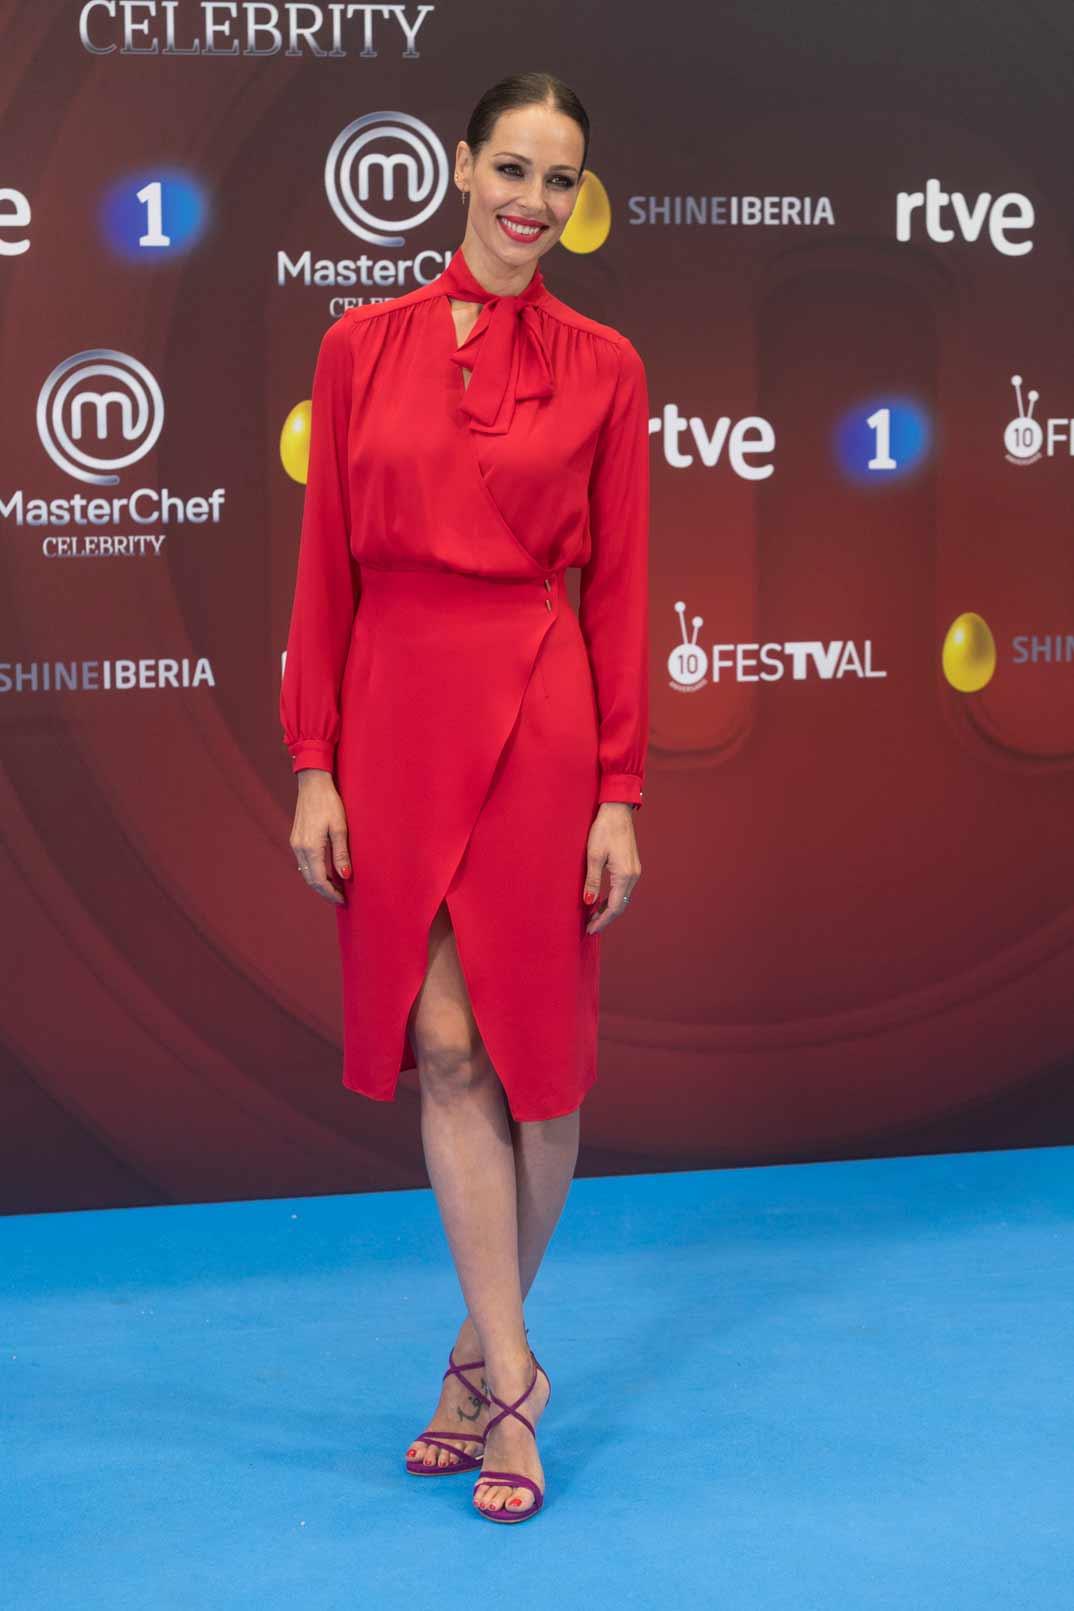 Eva González © MasterChef Celebrity